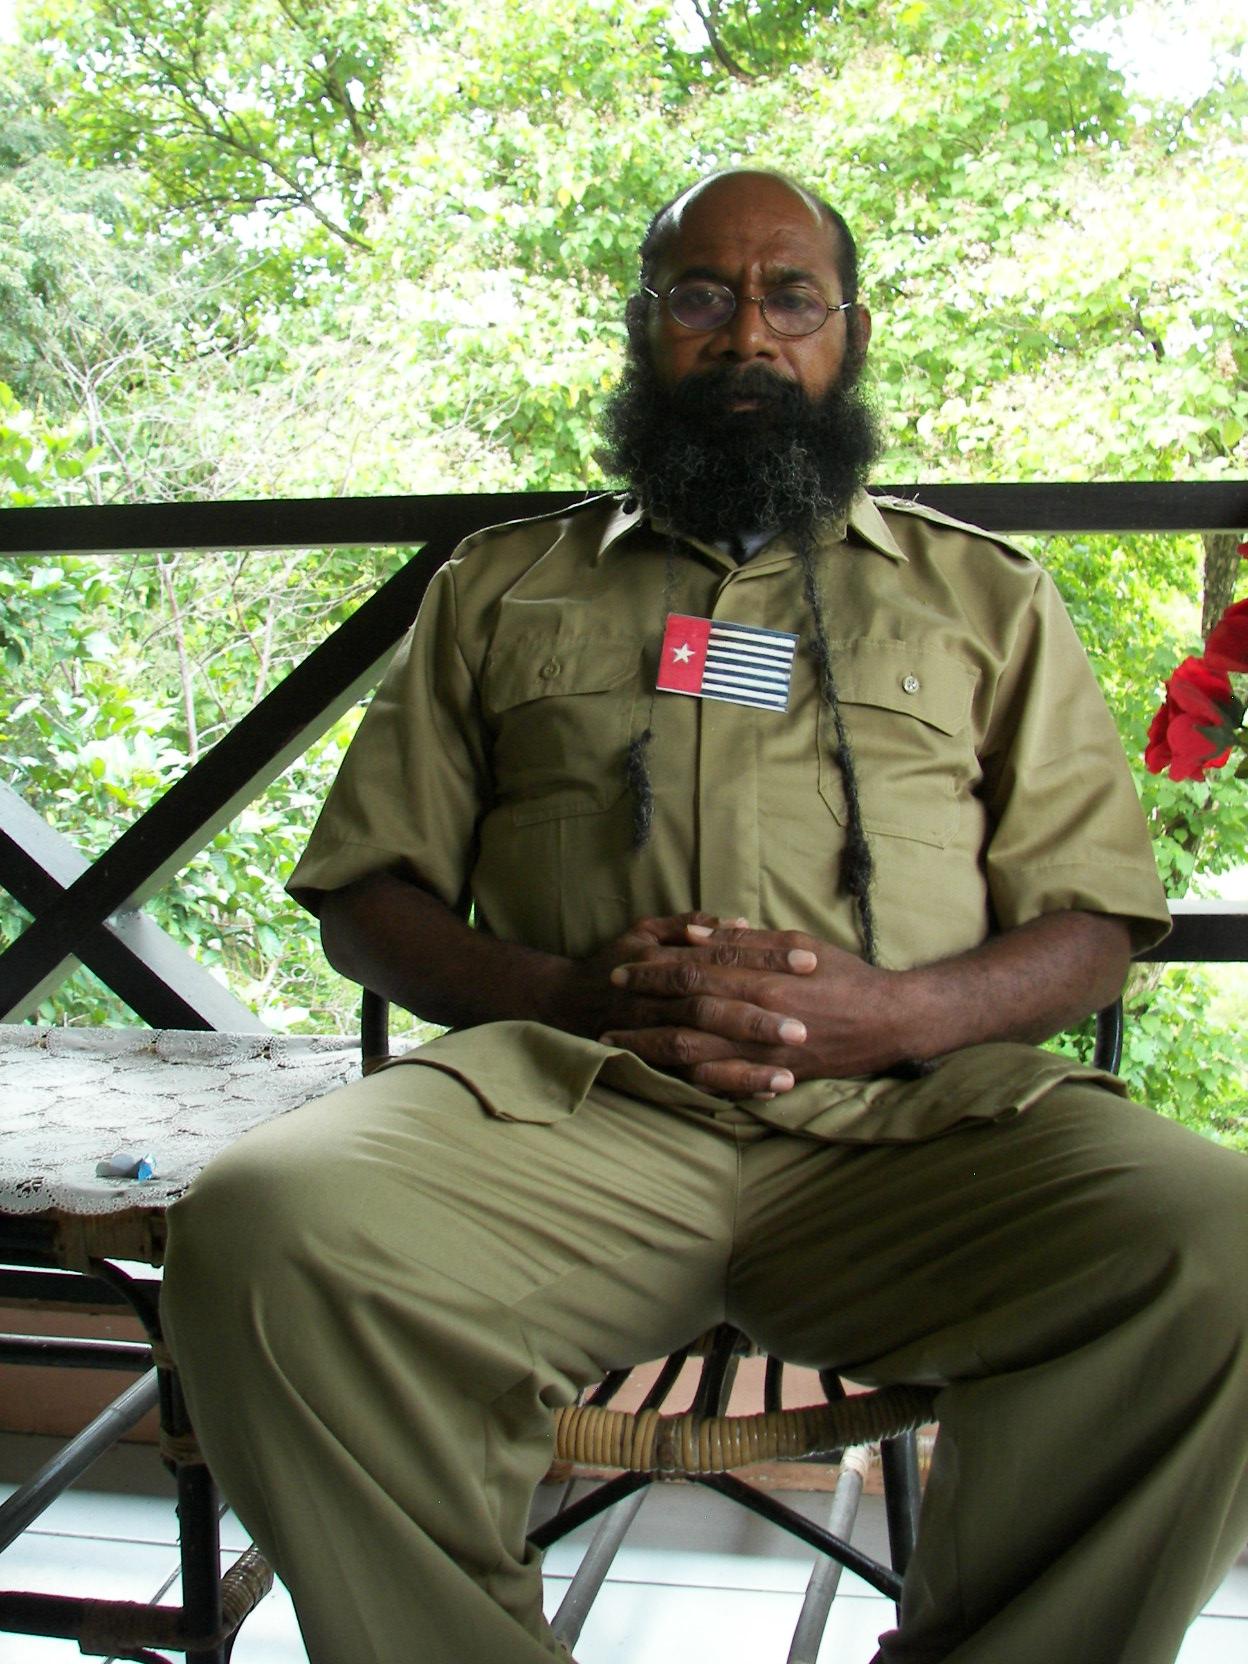 Filep Karma, an Amnesty International Prisoner of Conscience